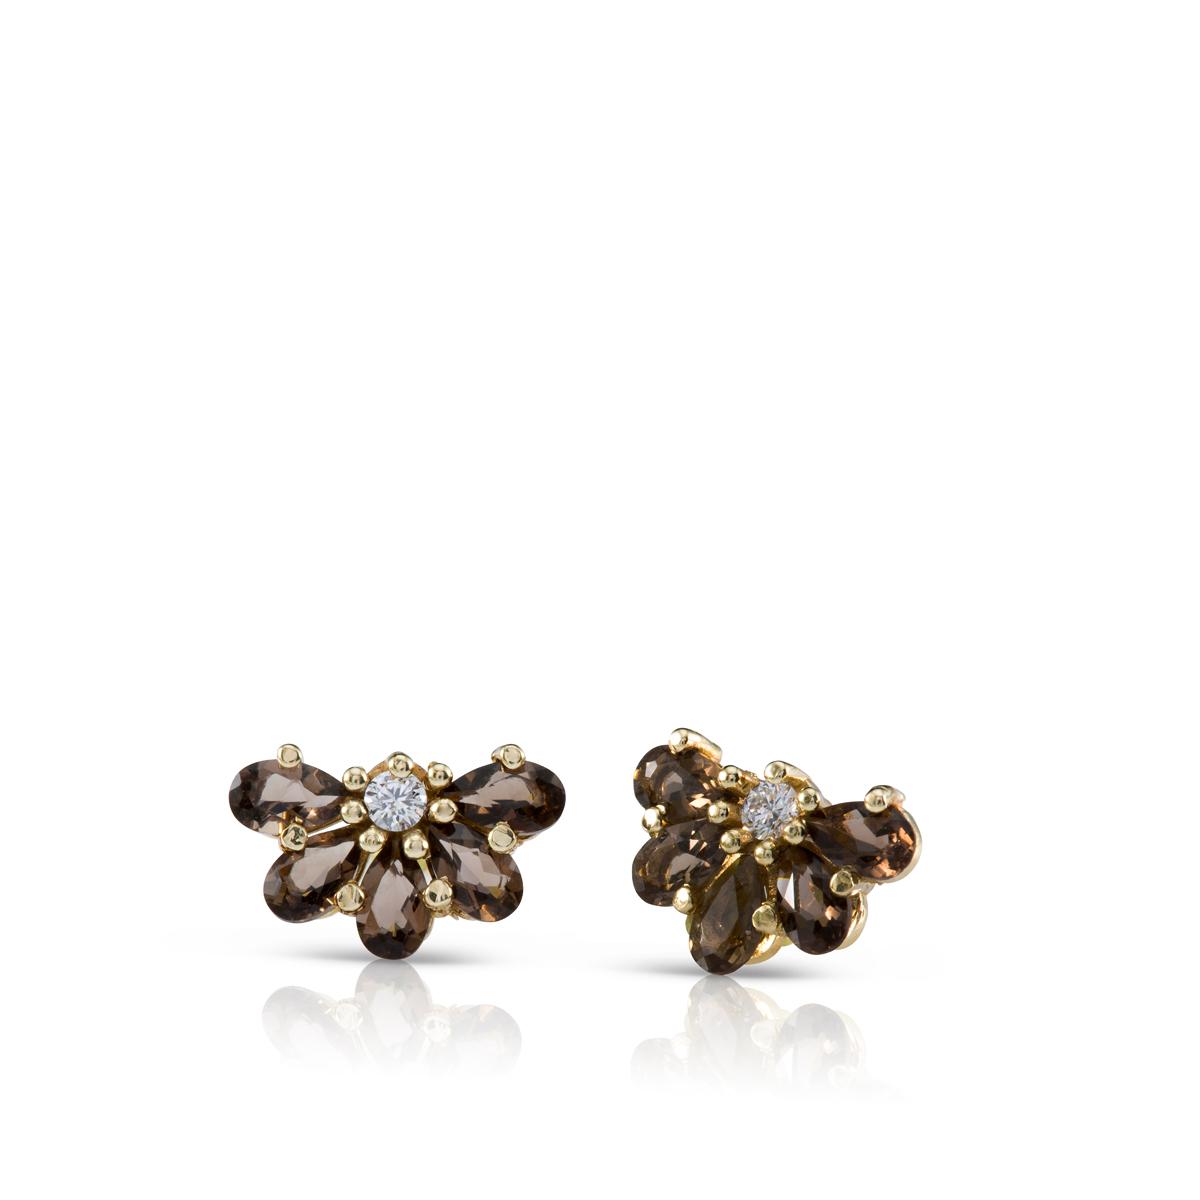 Diamonds and Smoky Quartz gold earrings